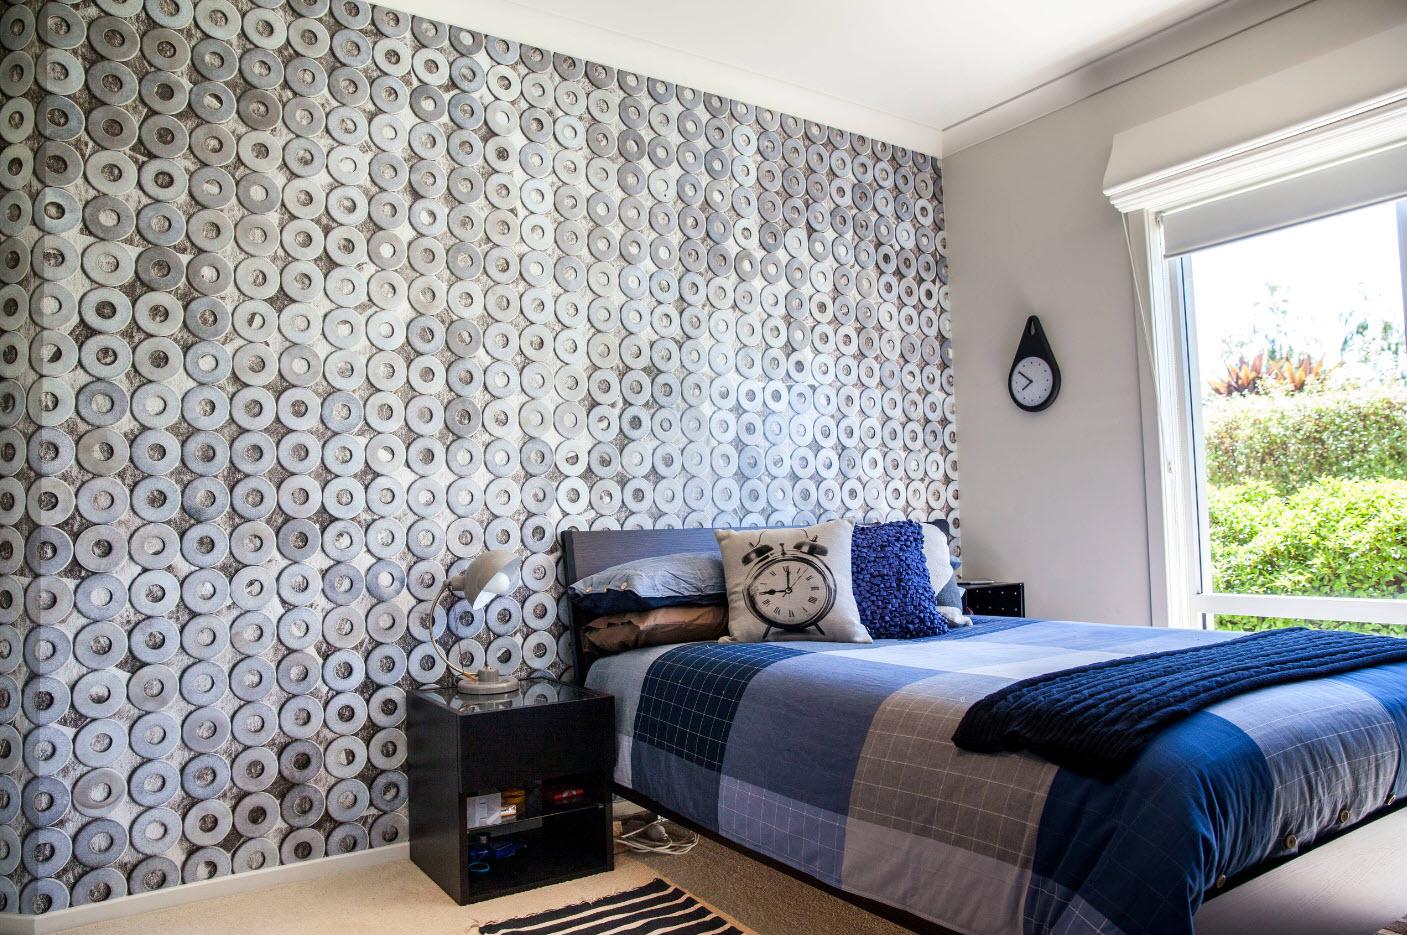 Декор для стен спальни своими руками